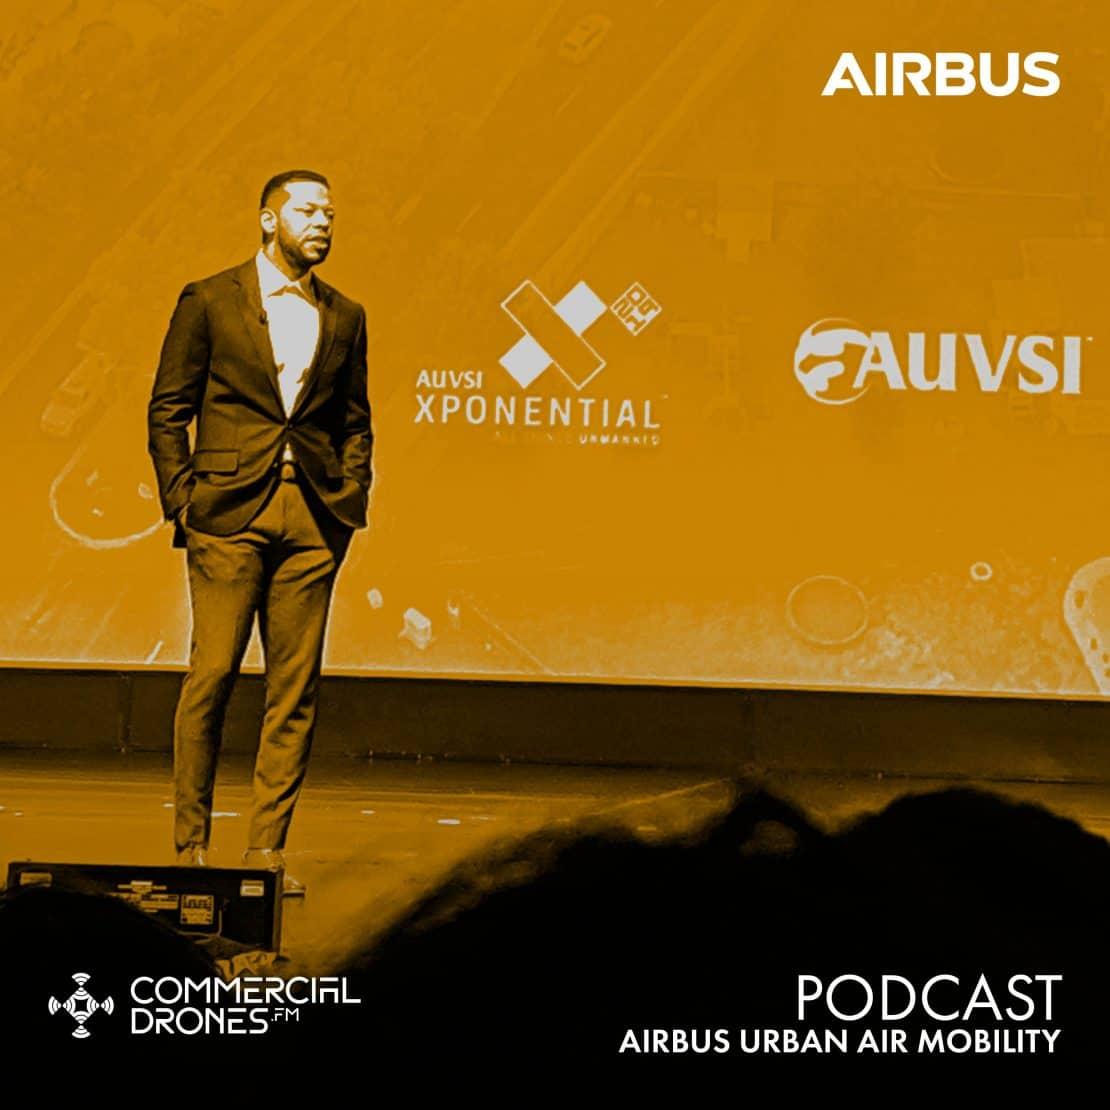 Travis Mason Airbus podcast - Urban Air Mobility